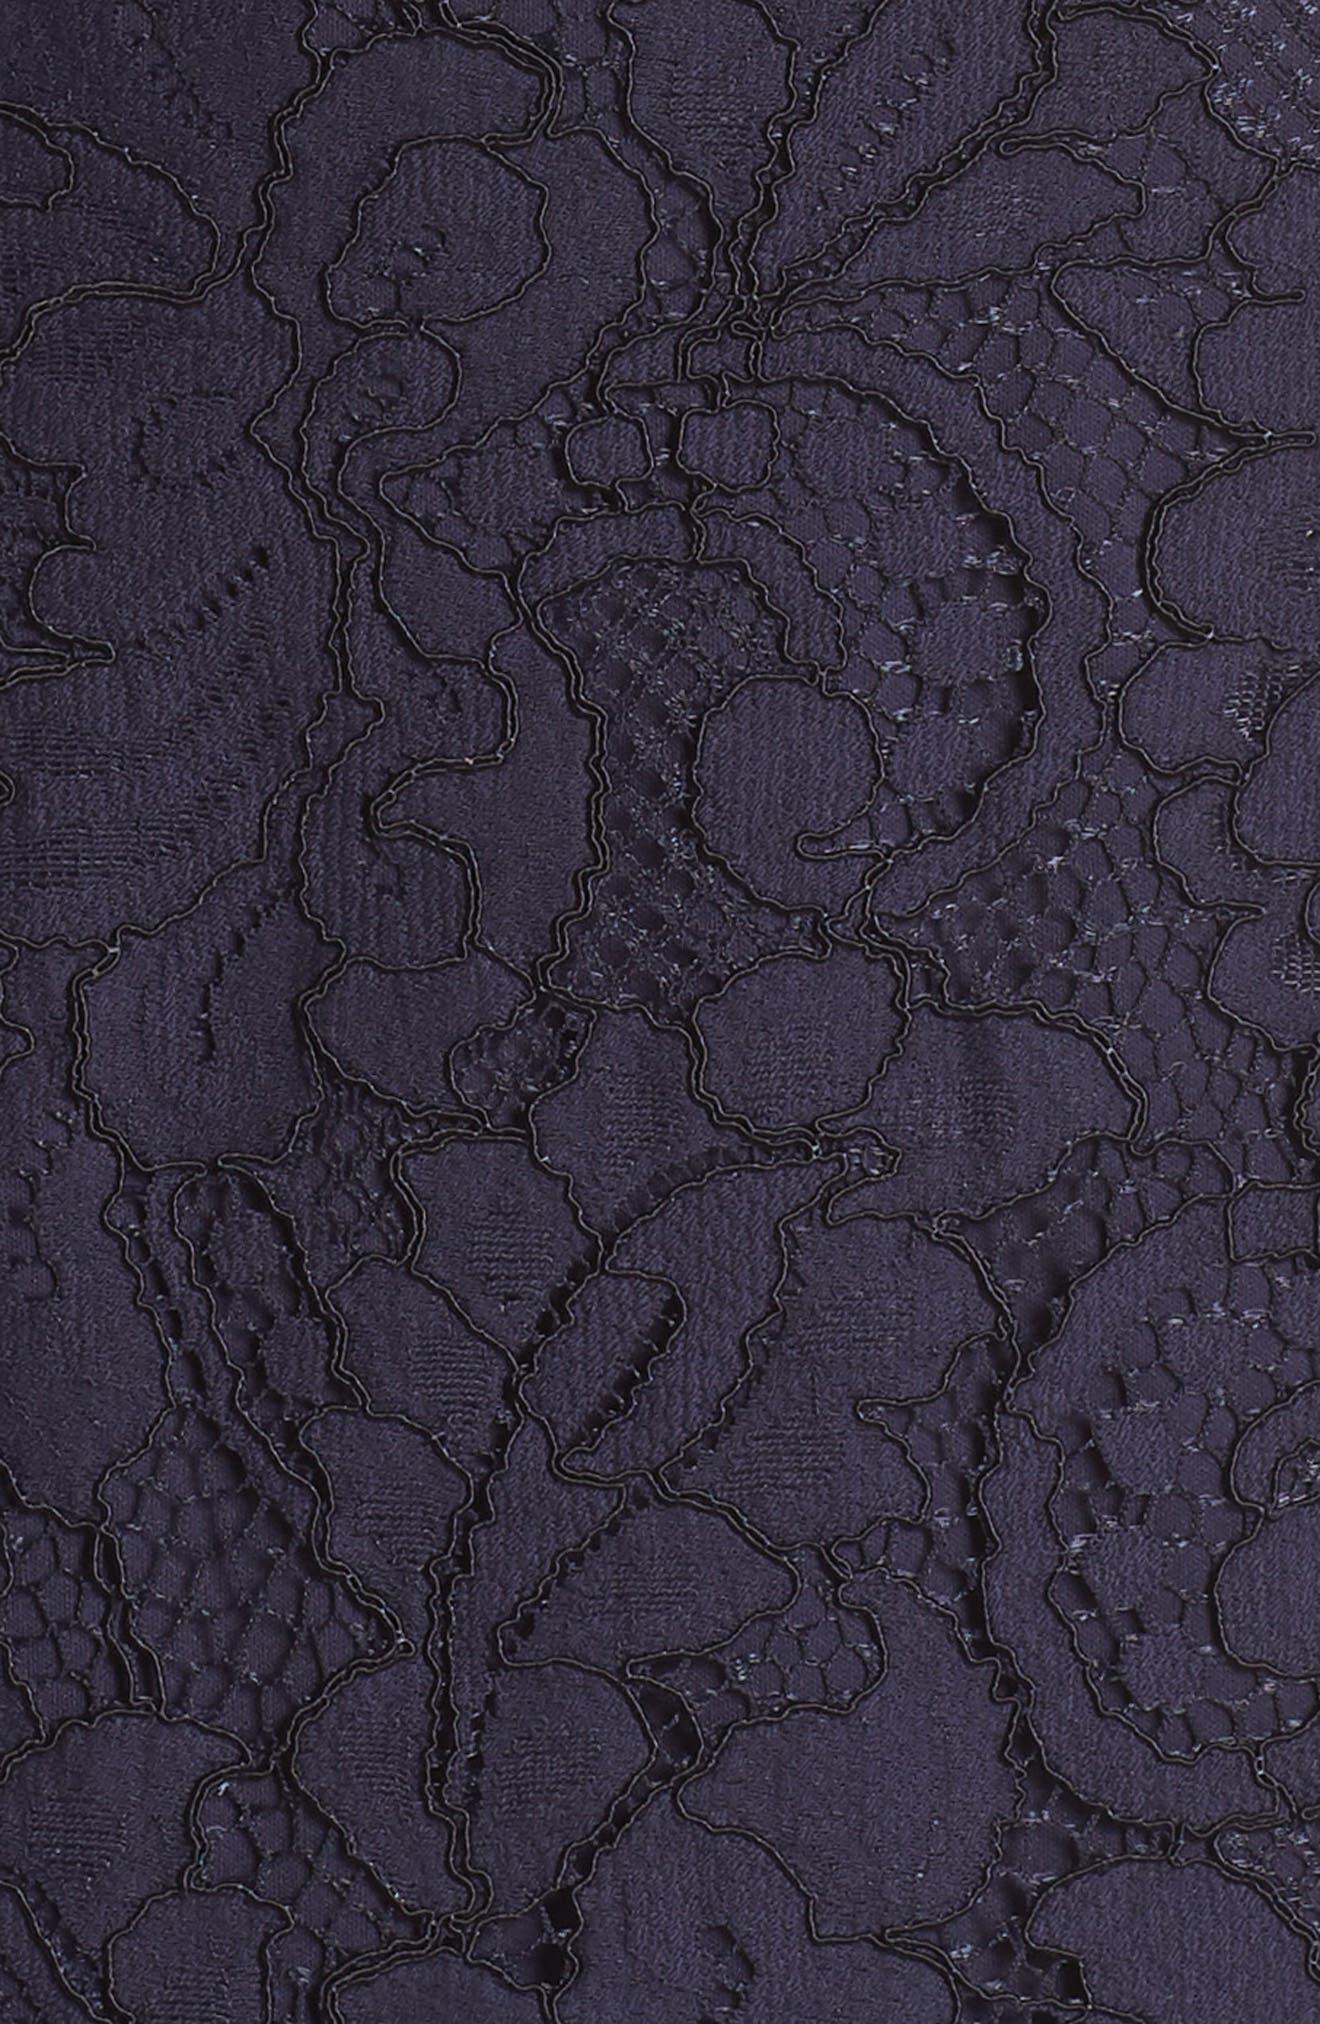 Lace Sheath Dress,                             Alternate thumbnail 6, color,                             Navy